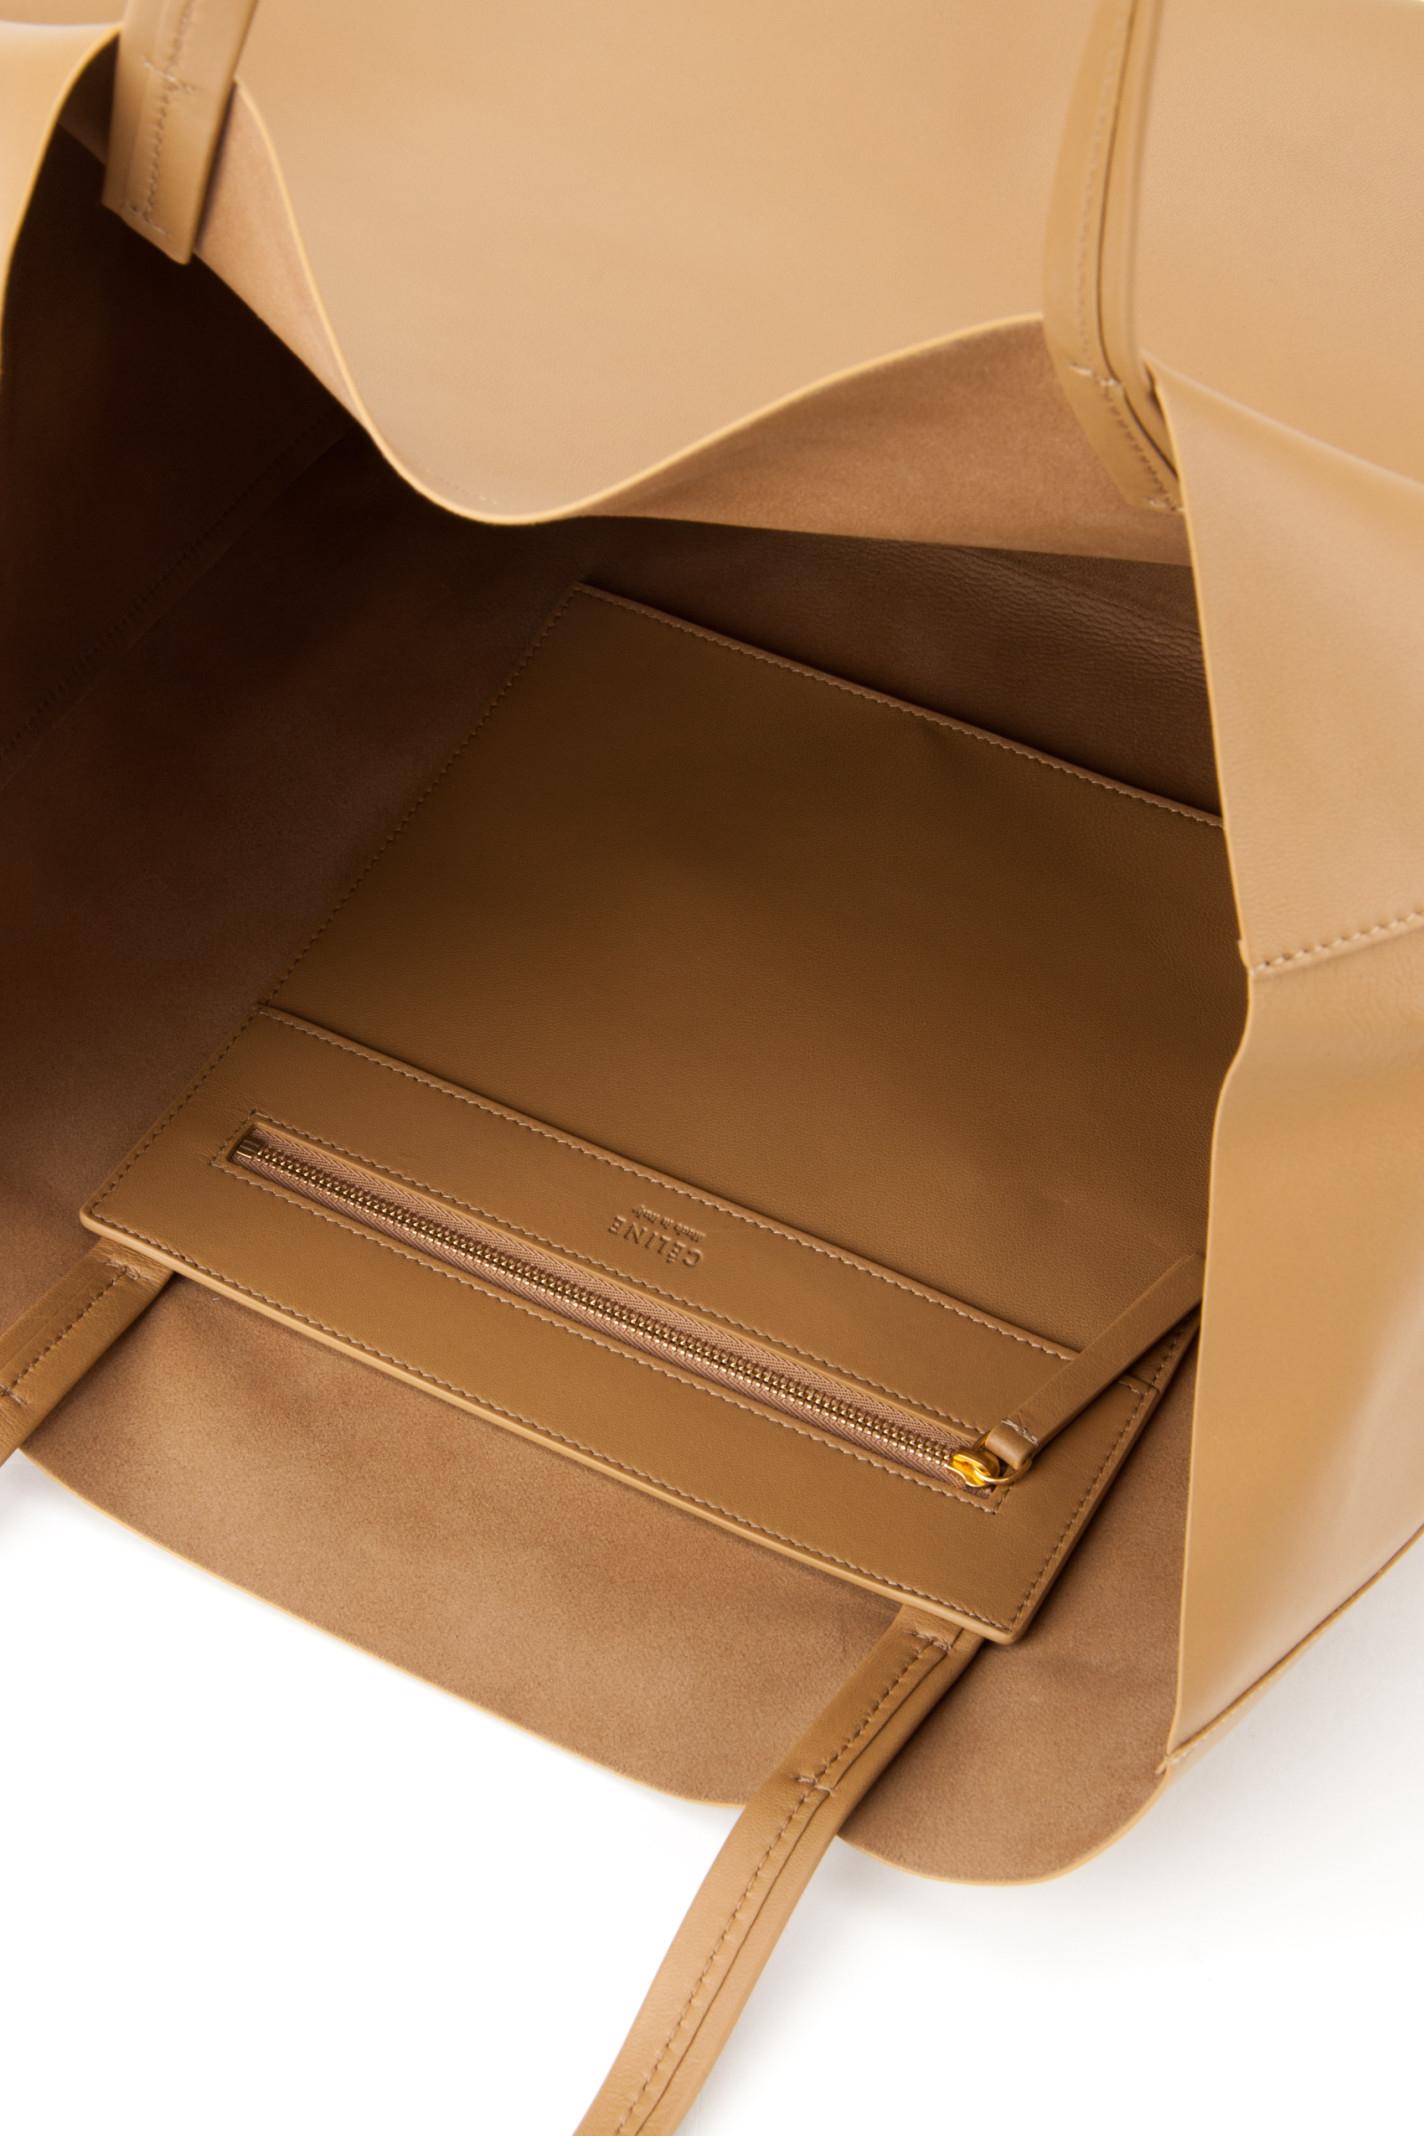 celine green suede phantom bag - celine cotton handbag, celine nano luggage bag